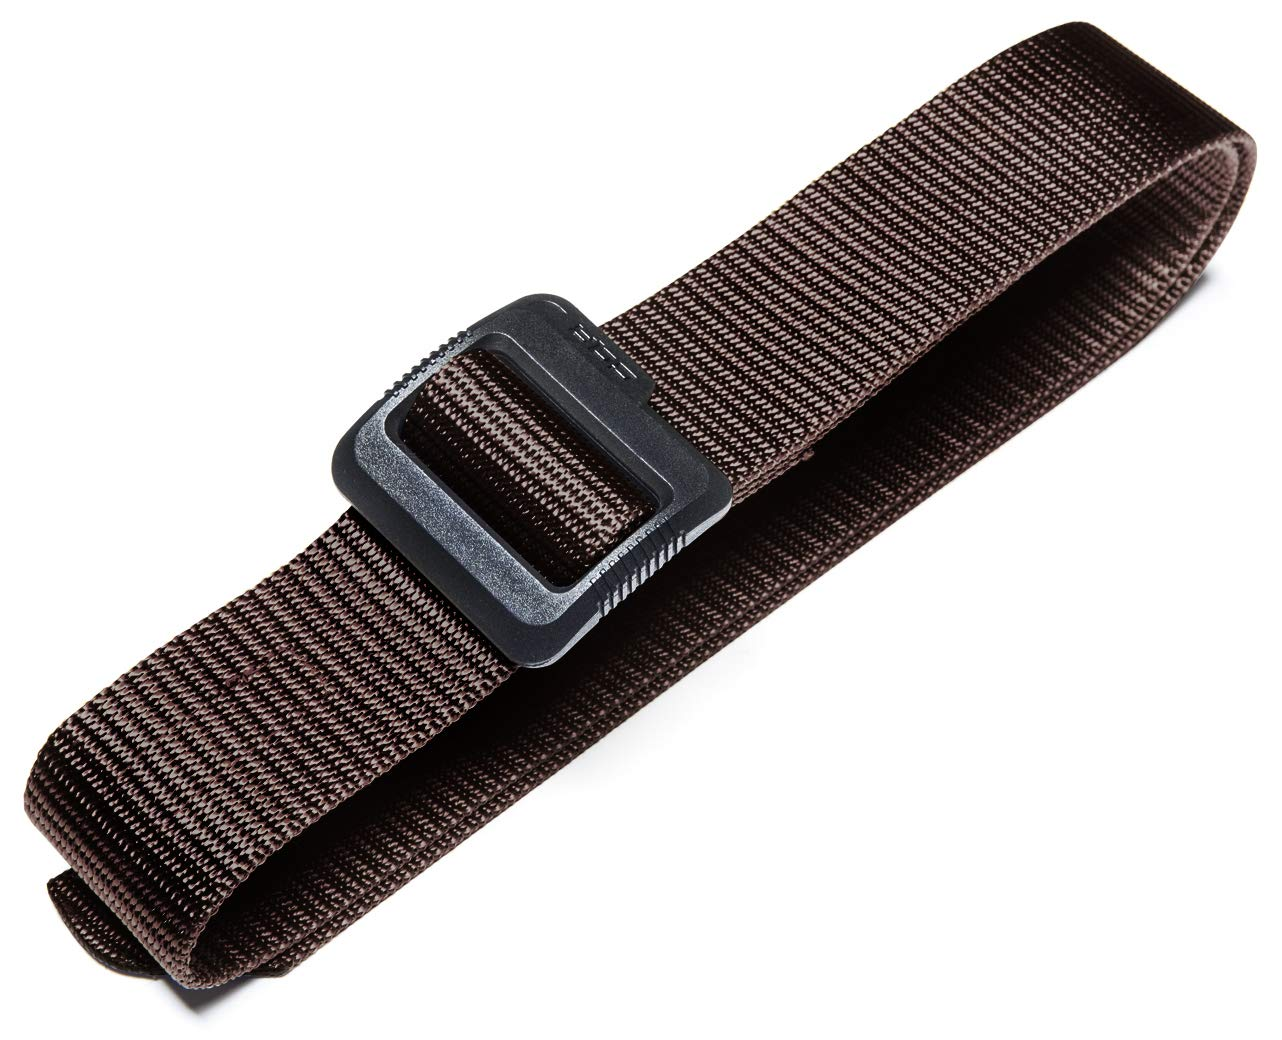 CQR CQ-MZT01-BRN_M(w32-34) Tactical Belt 100% Full Refund Assurance Nylon Webbing EDC Duty 1.5'' Belt MZT01 by CQR (Image #4)